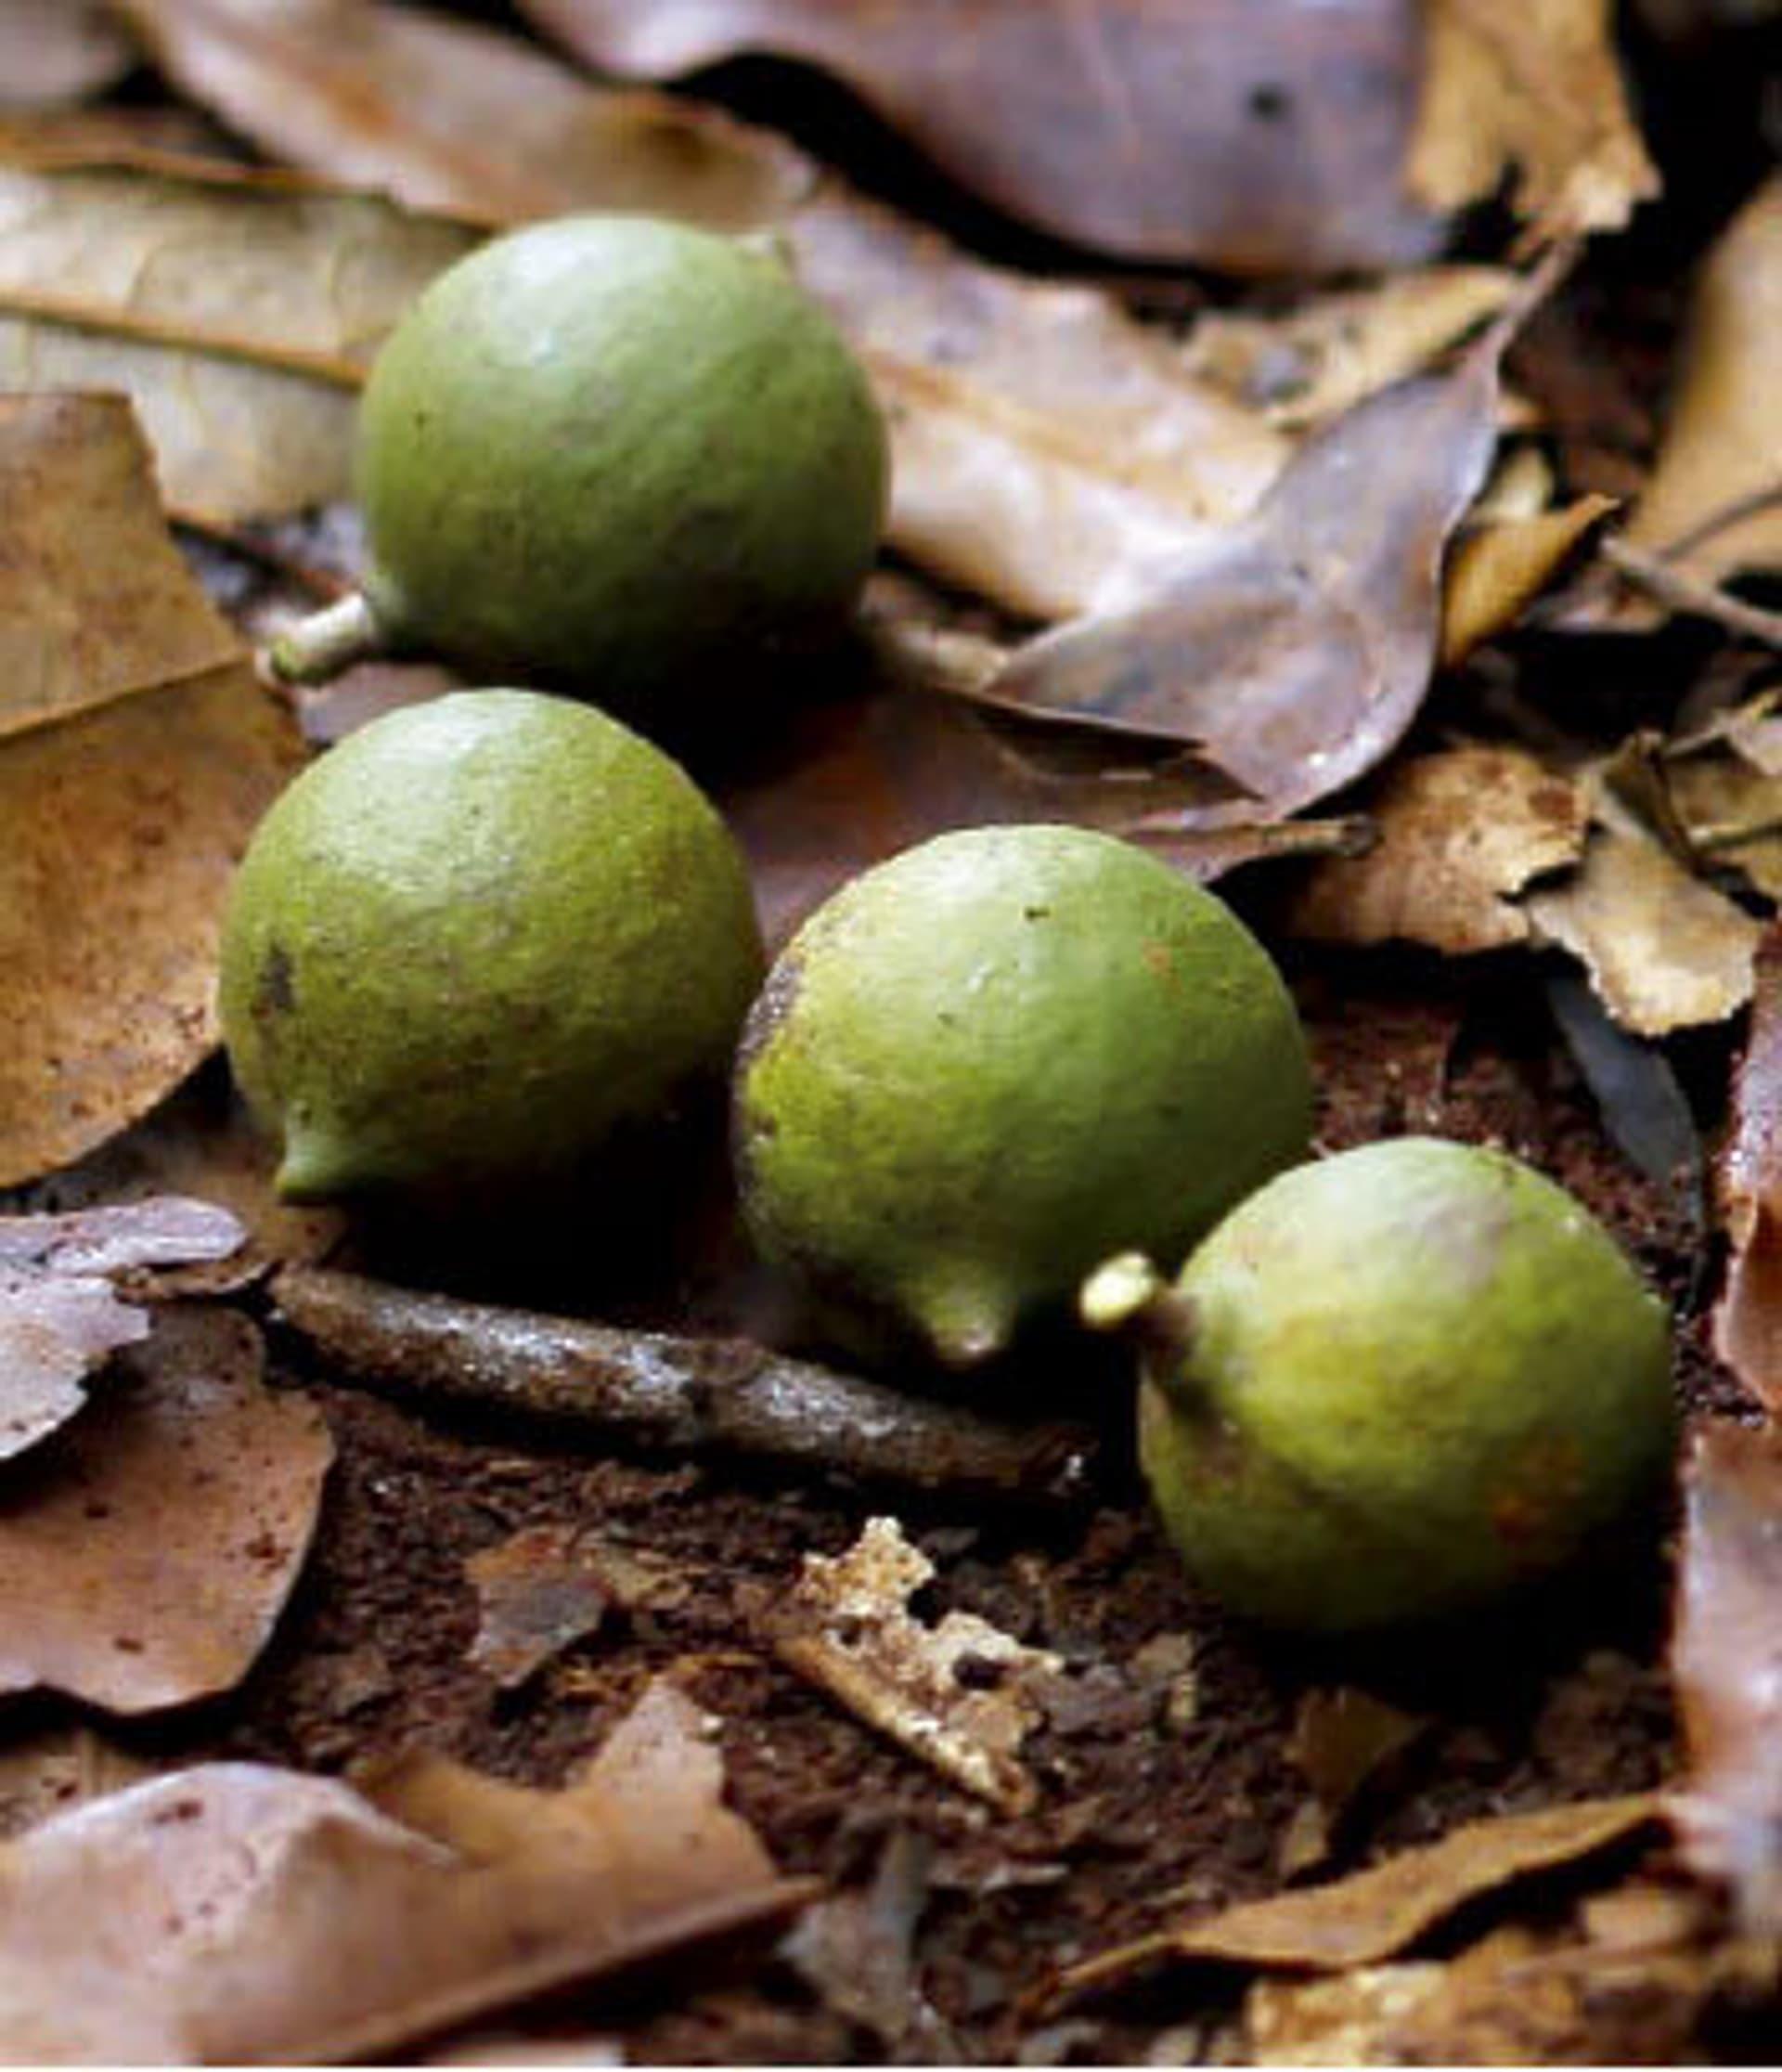 Dr hauschka macadamia nuesse